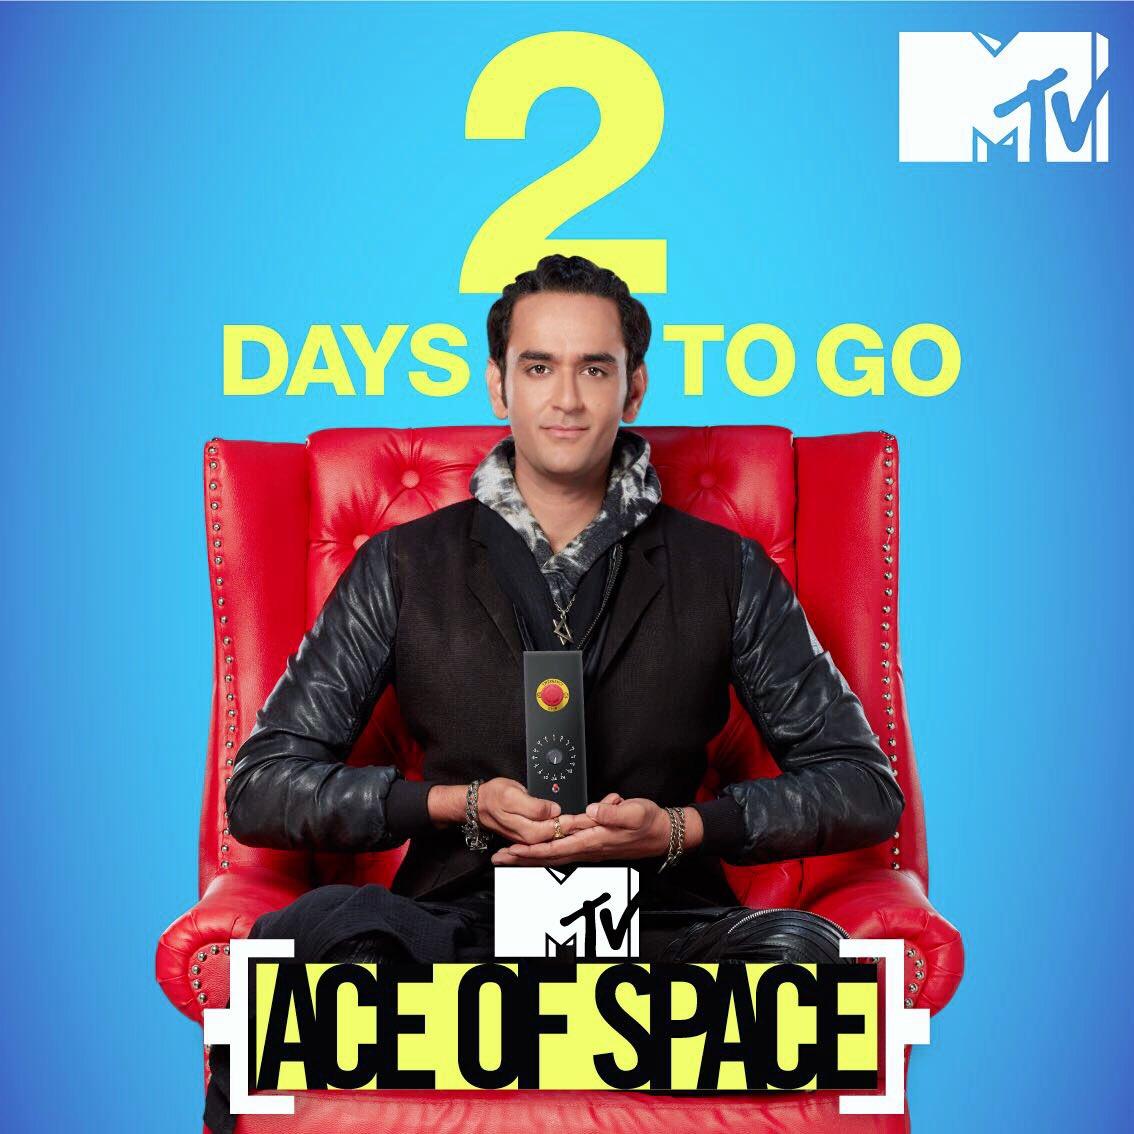 MTV Ace of Space' contestants revealed: Divya Agarwal, Varun Sood